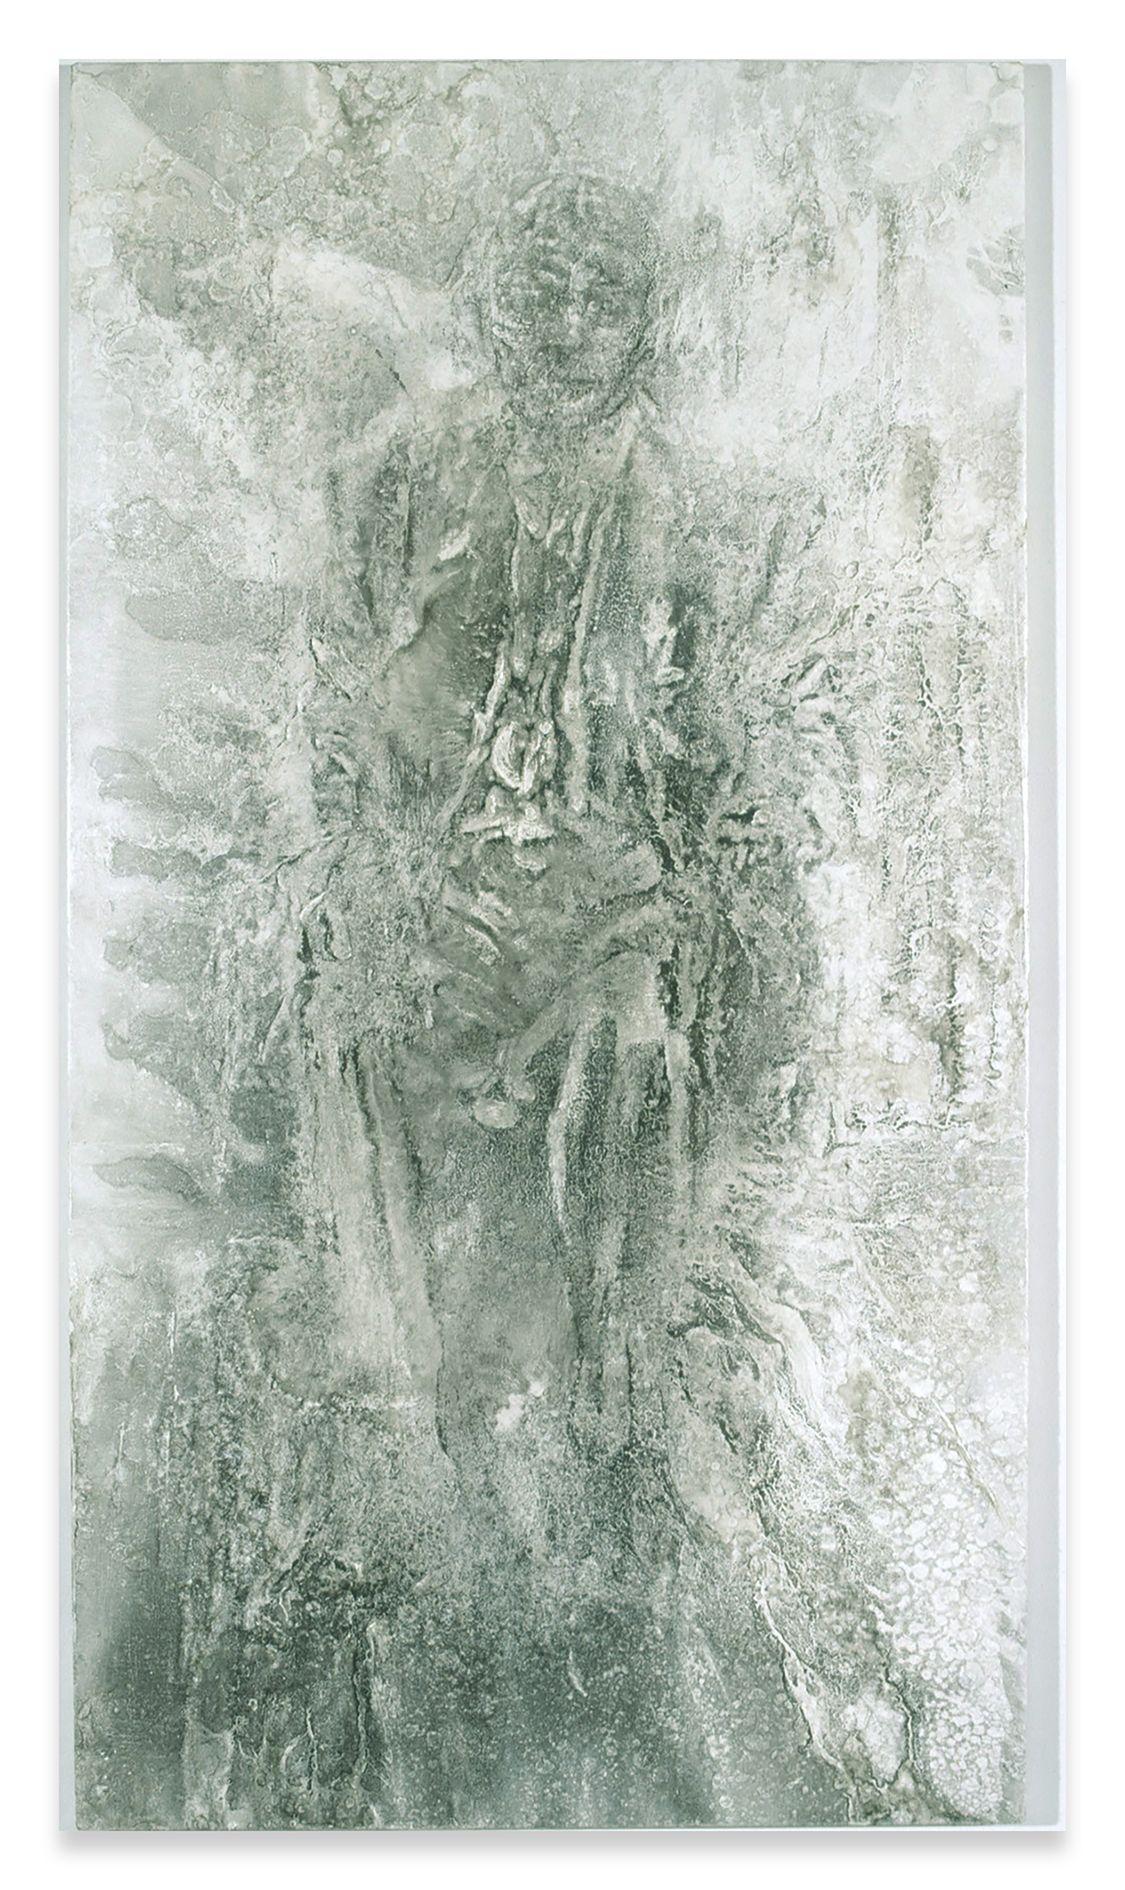 Axel Kasseböhmer – Axel Kasseböhmer – Cologne